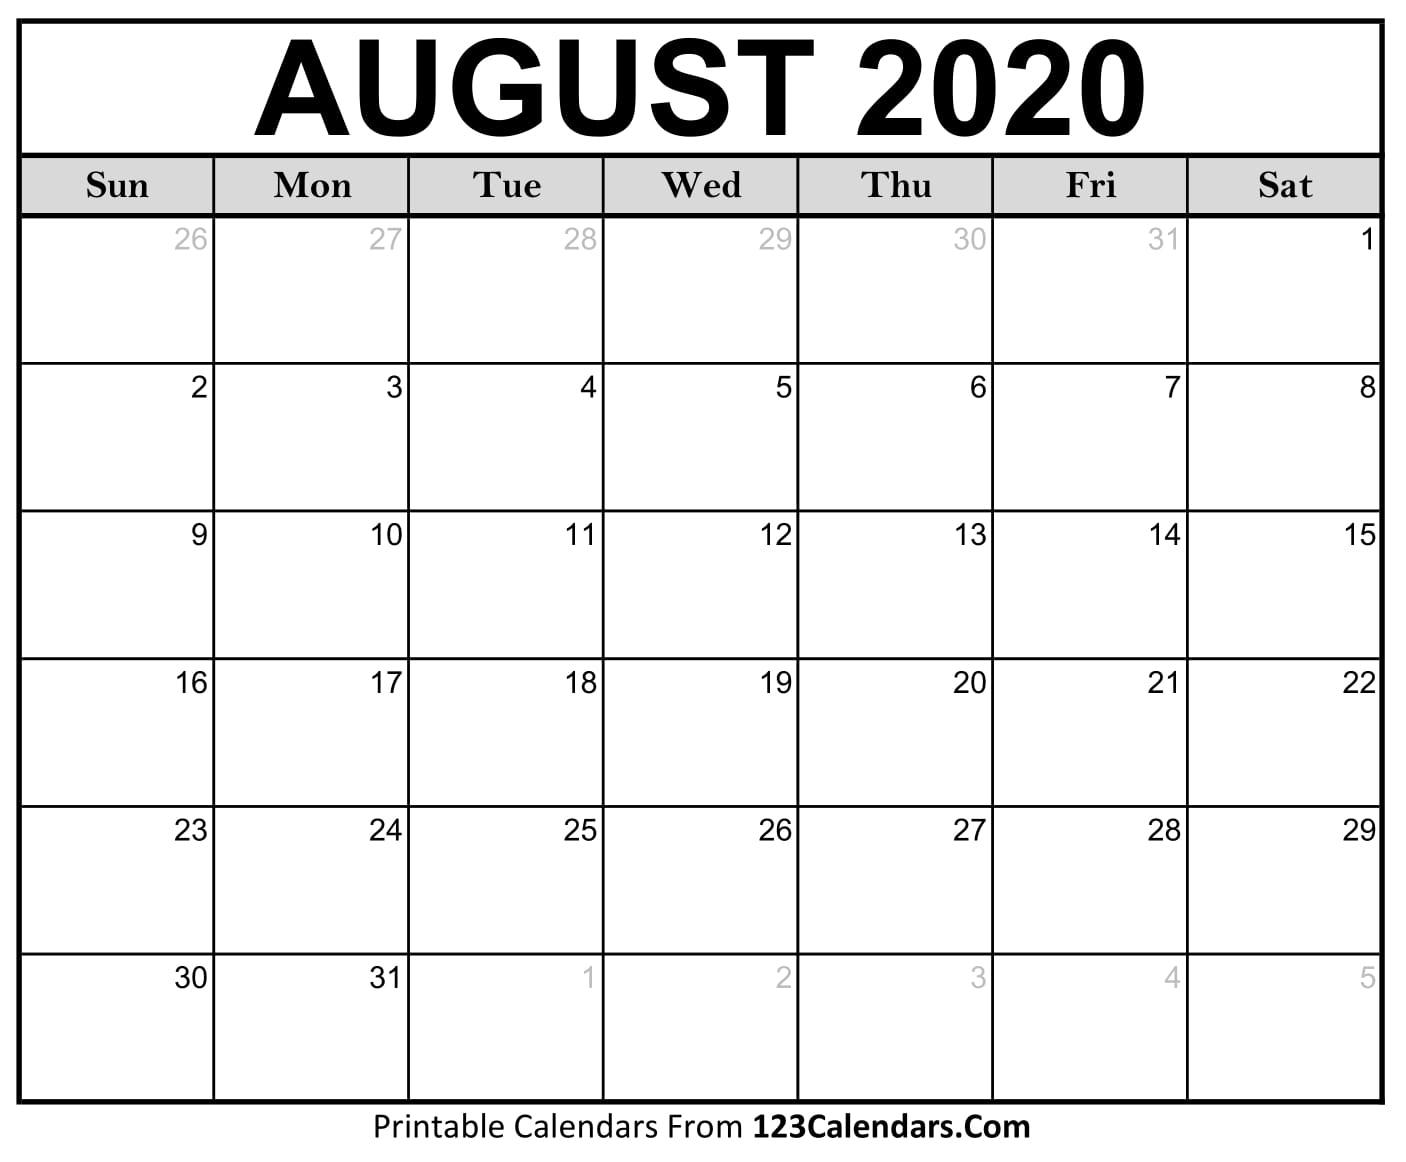 August 2020 Printable Calendar | 123Calendars